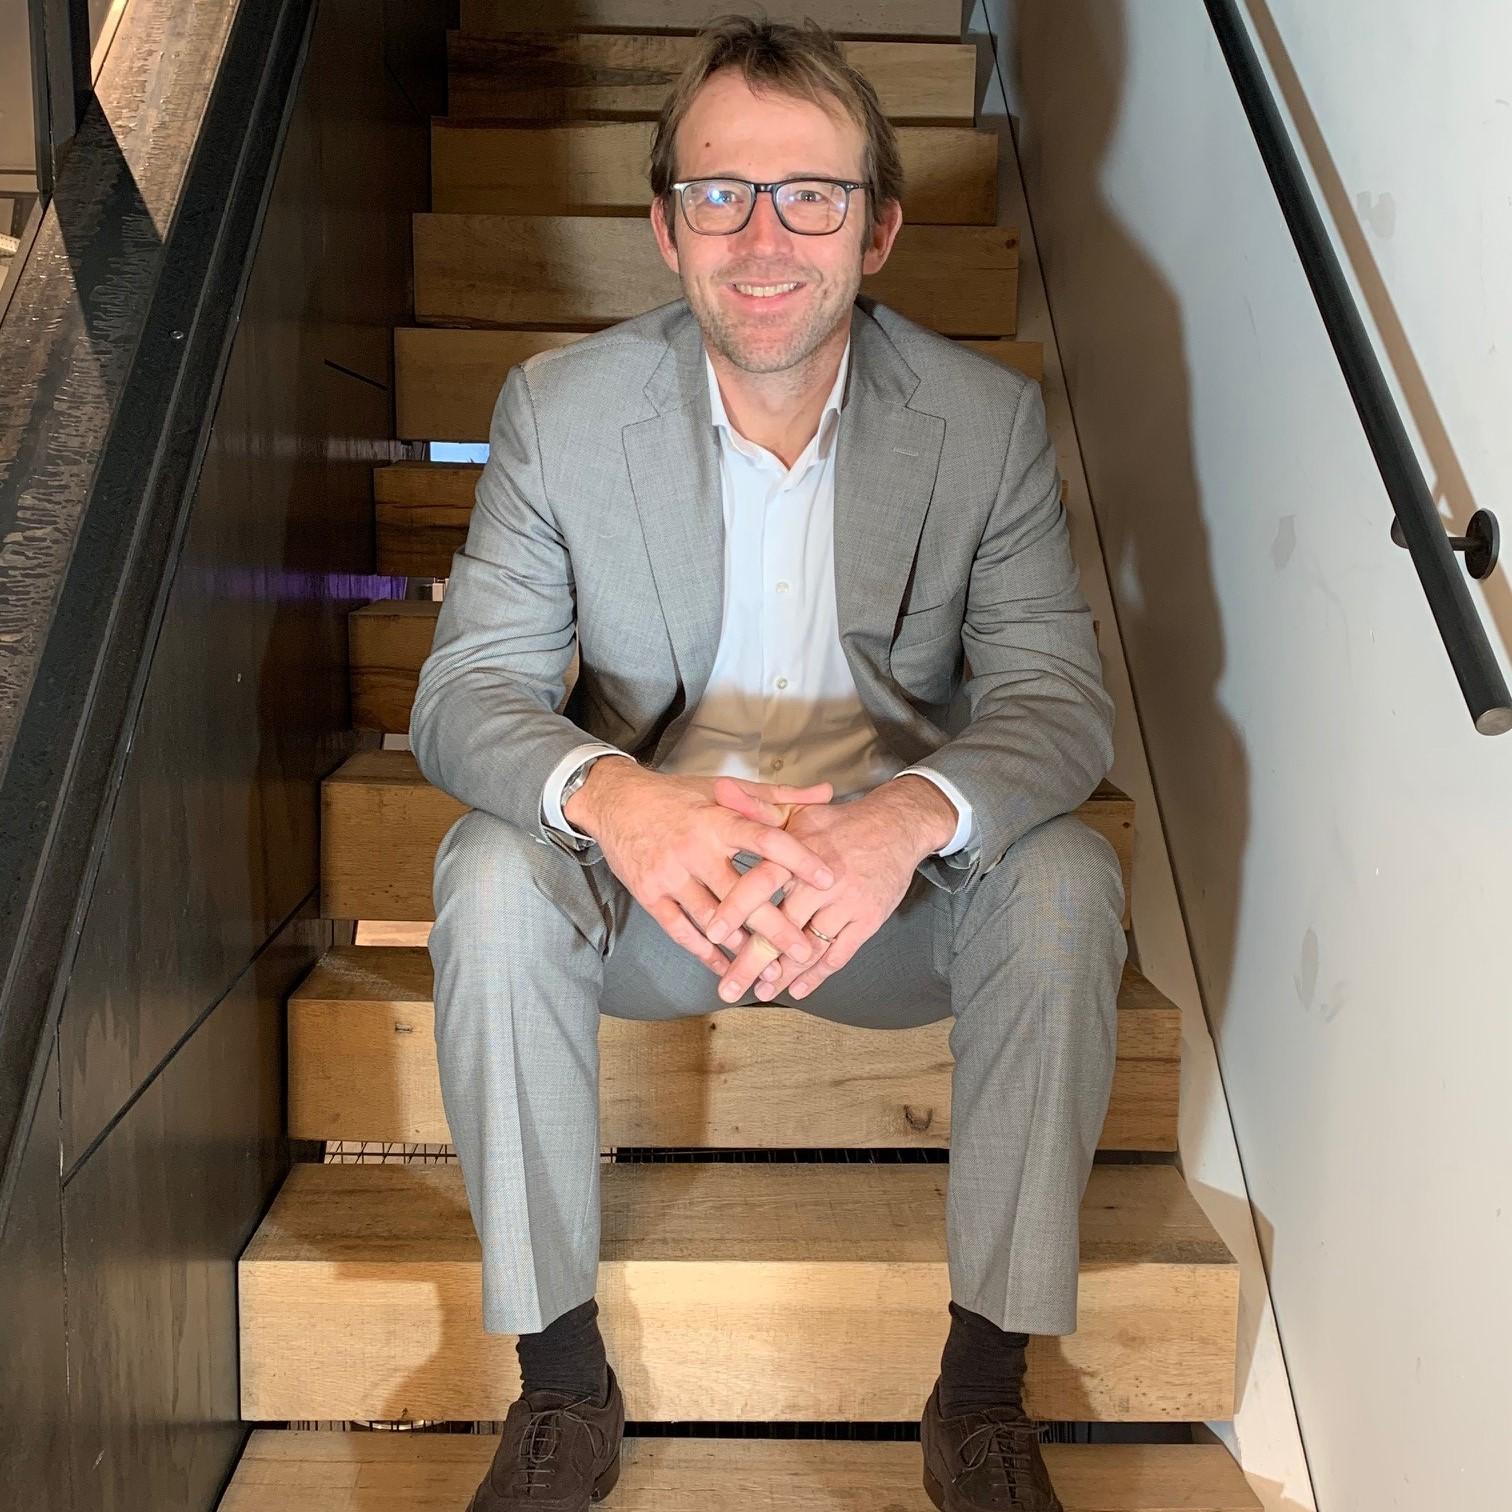 David de Jong